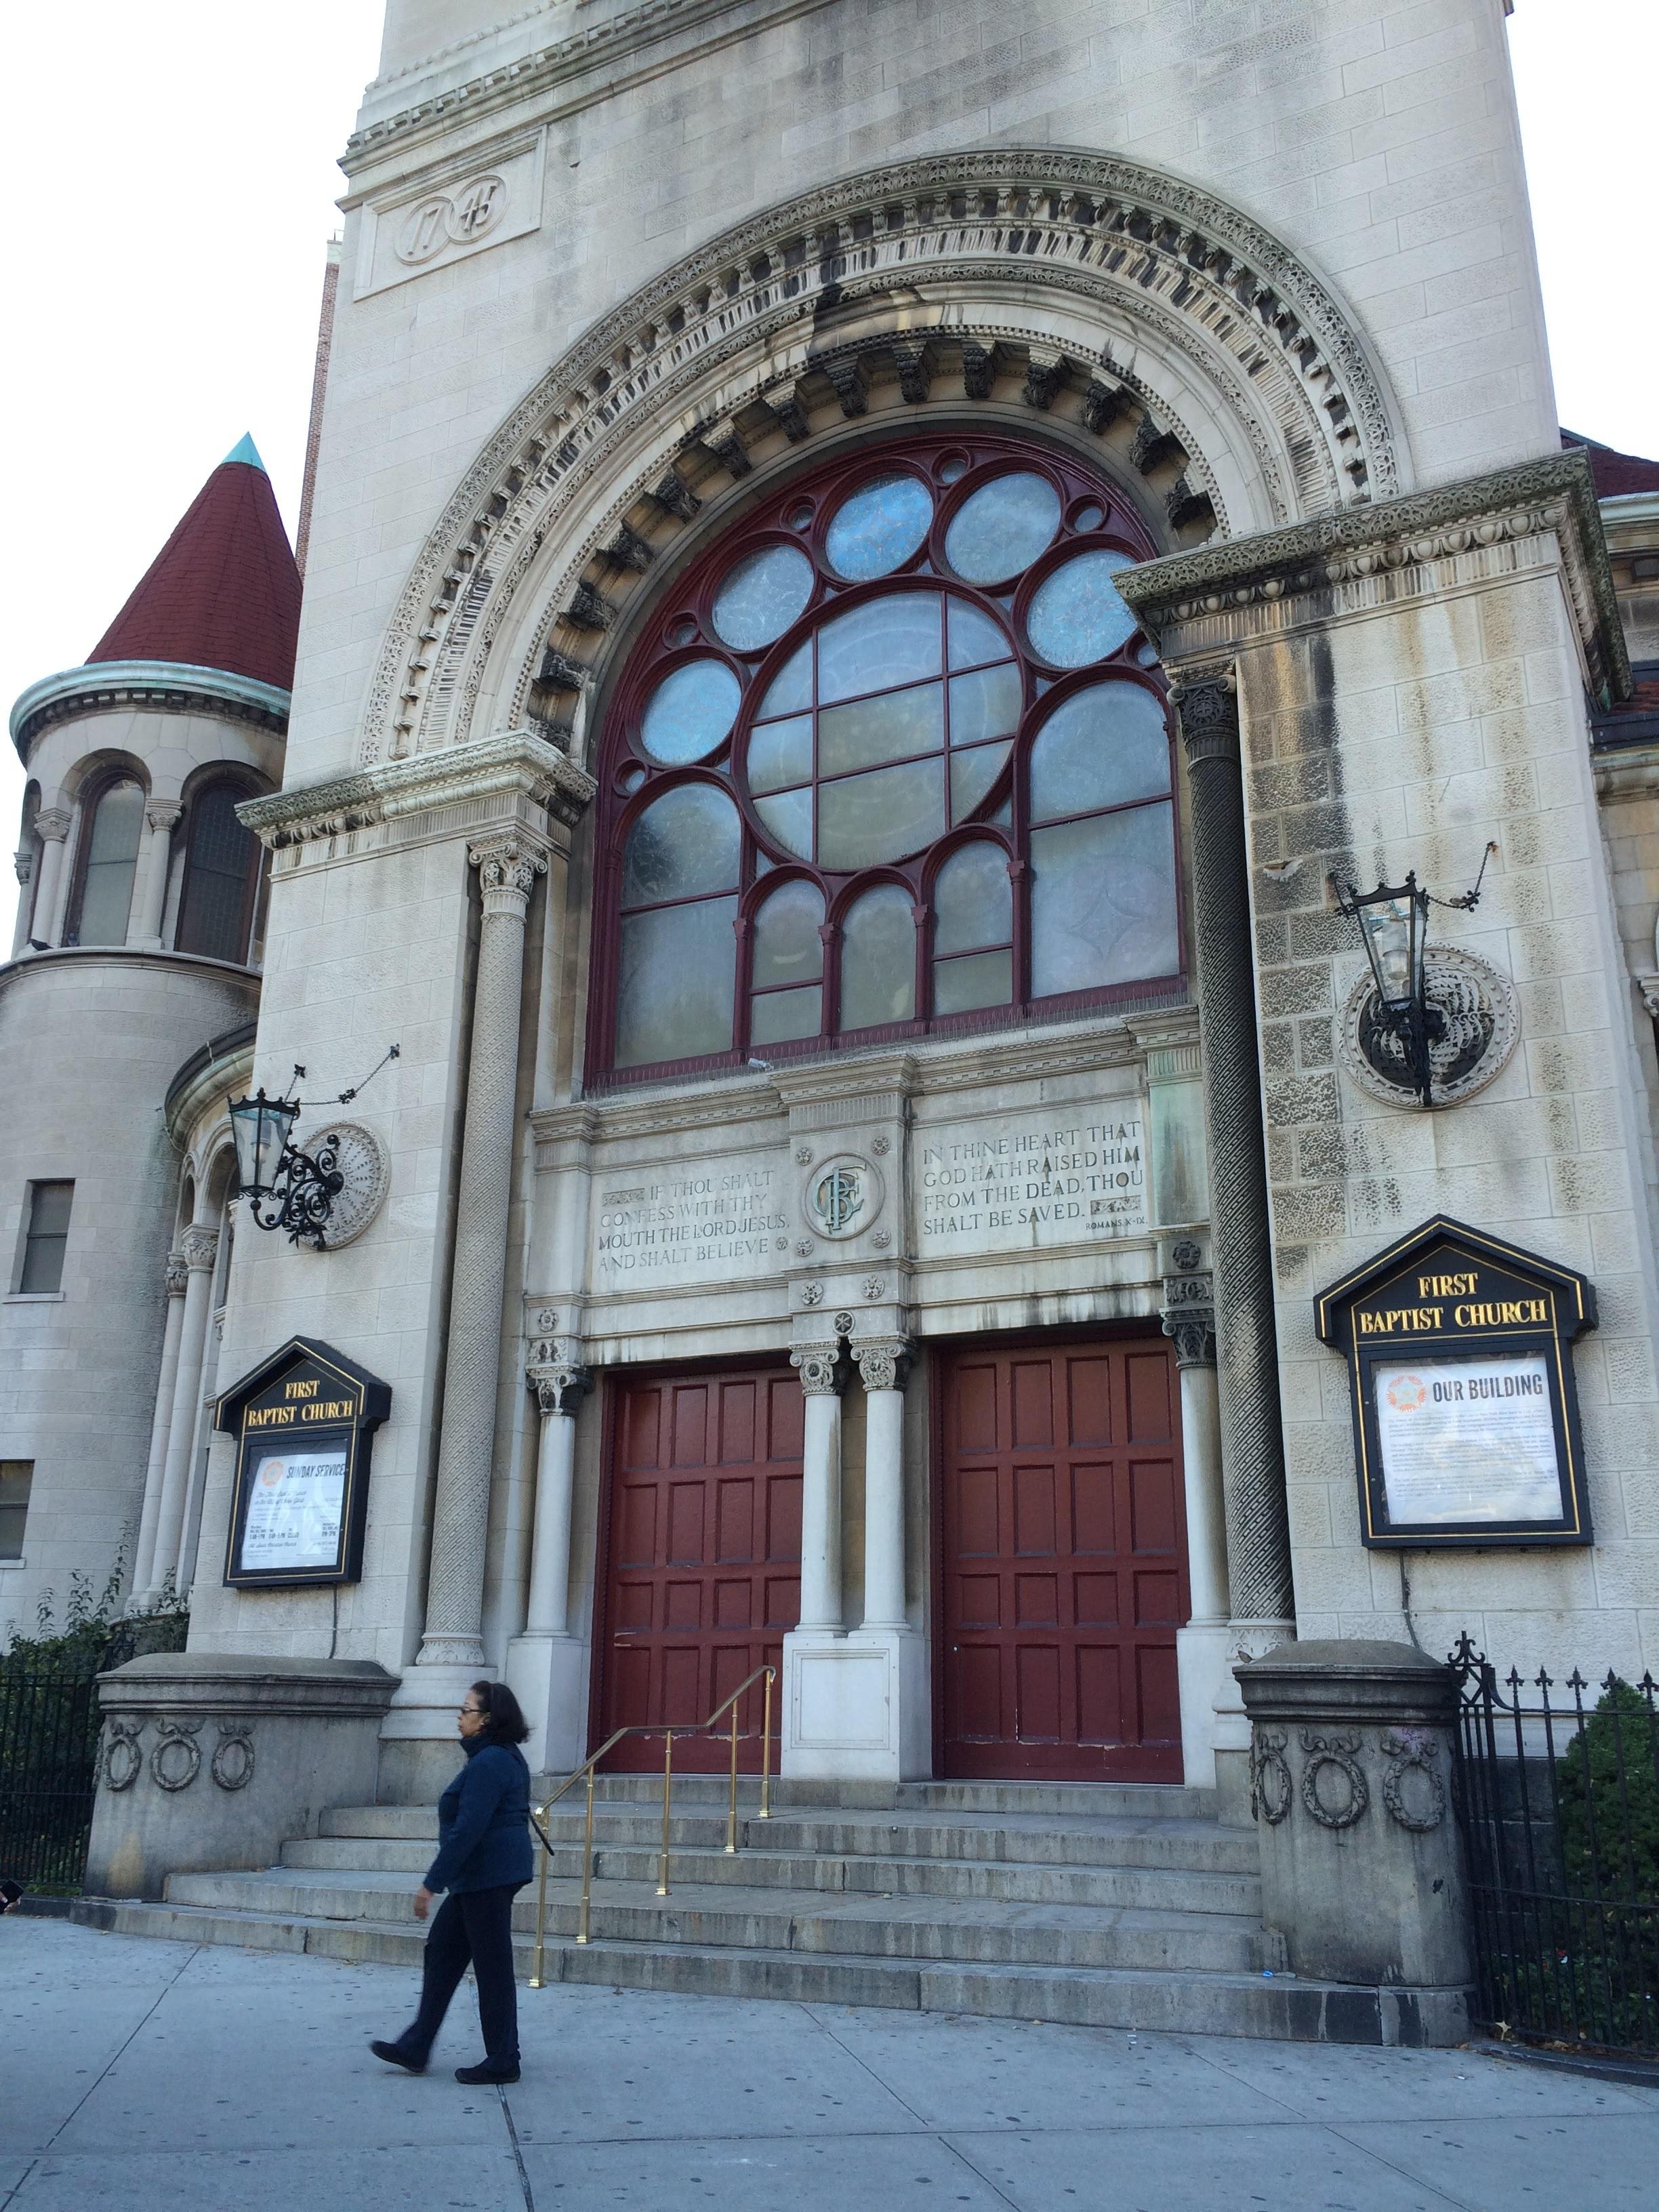 19. First Baptist Church